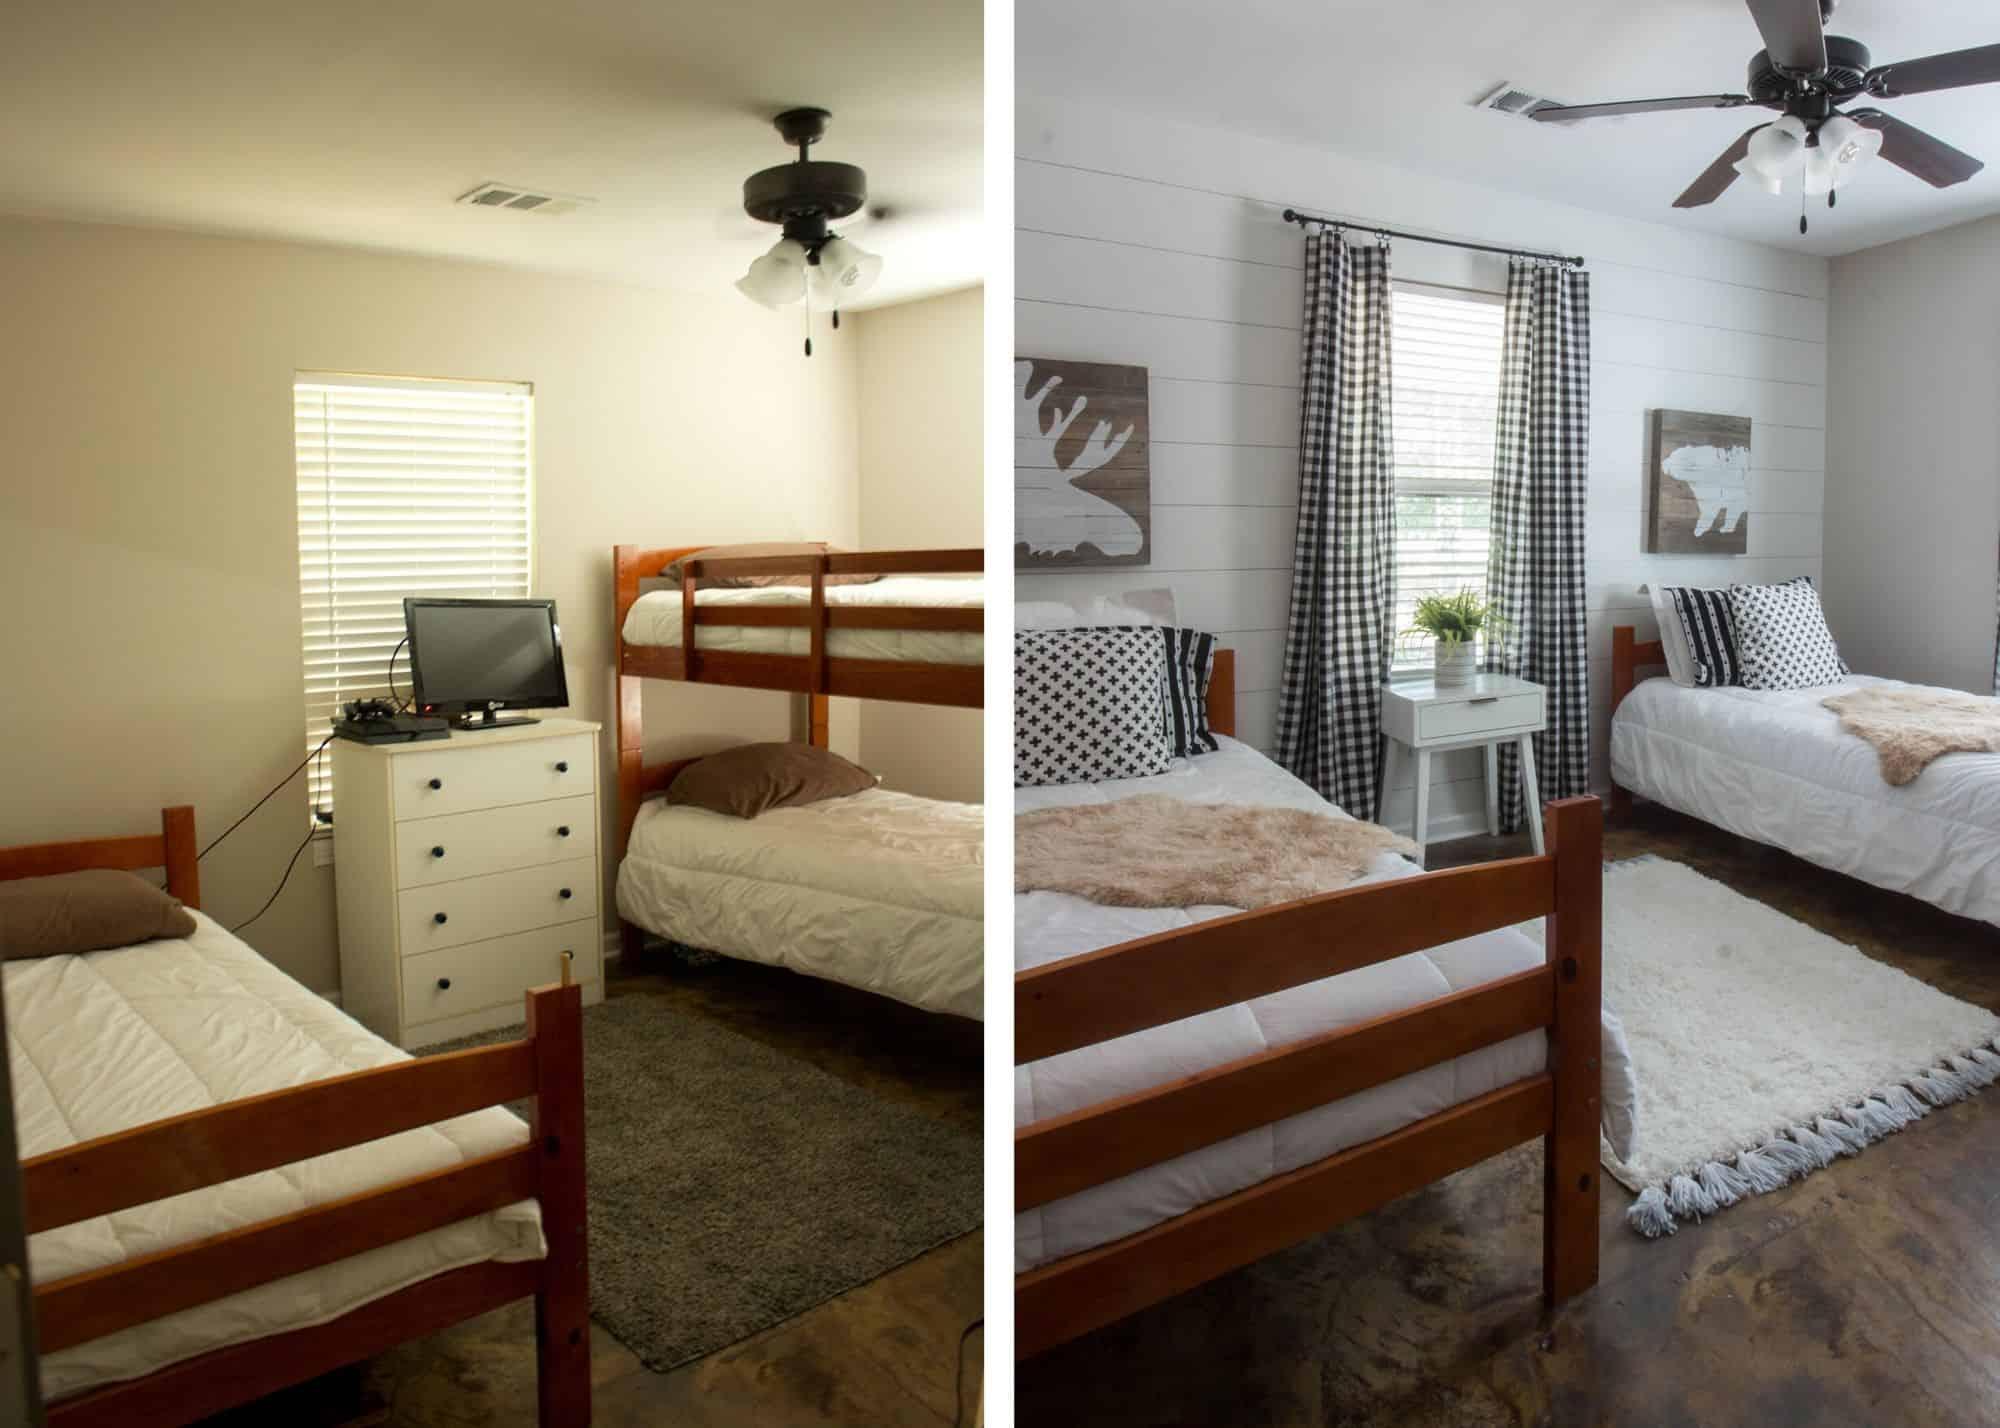 Lake House Boys Room Makeover for Under $100